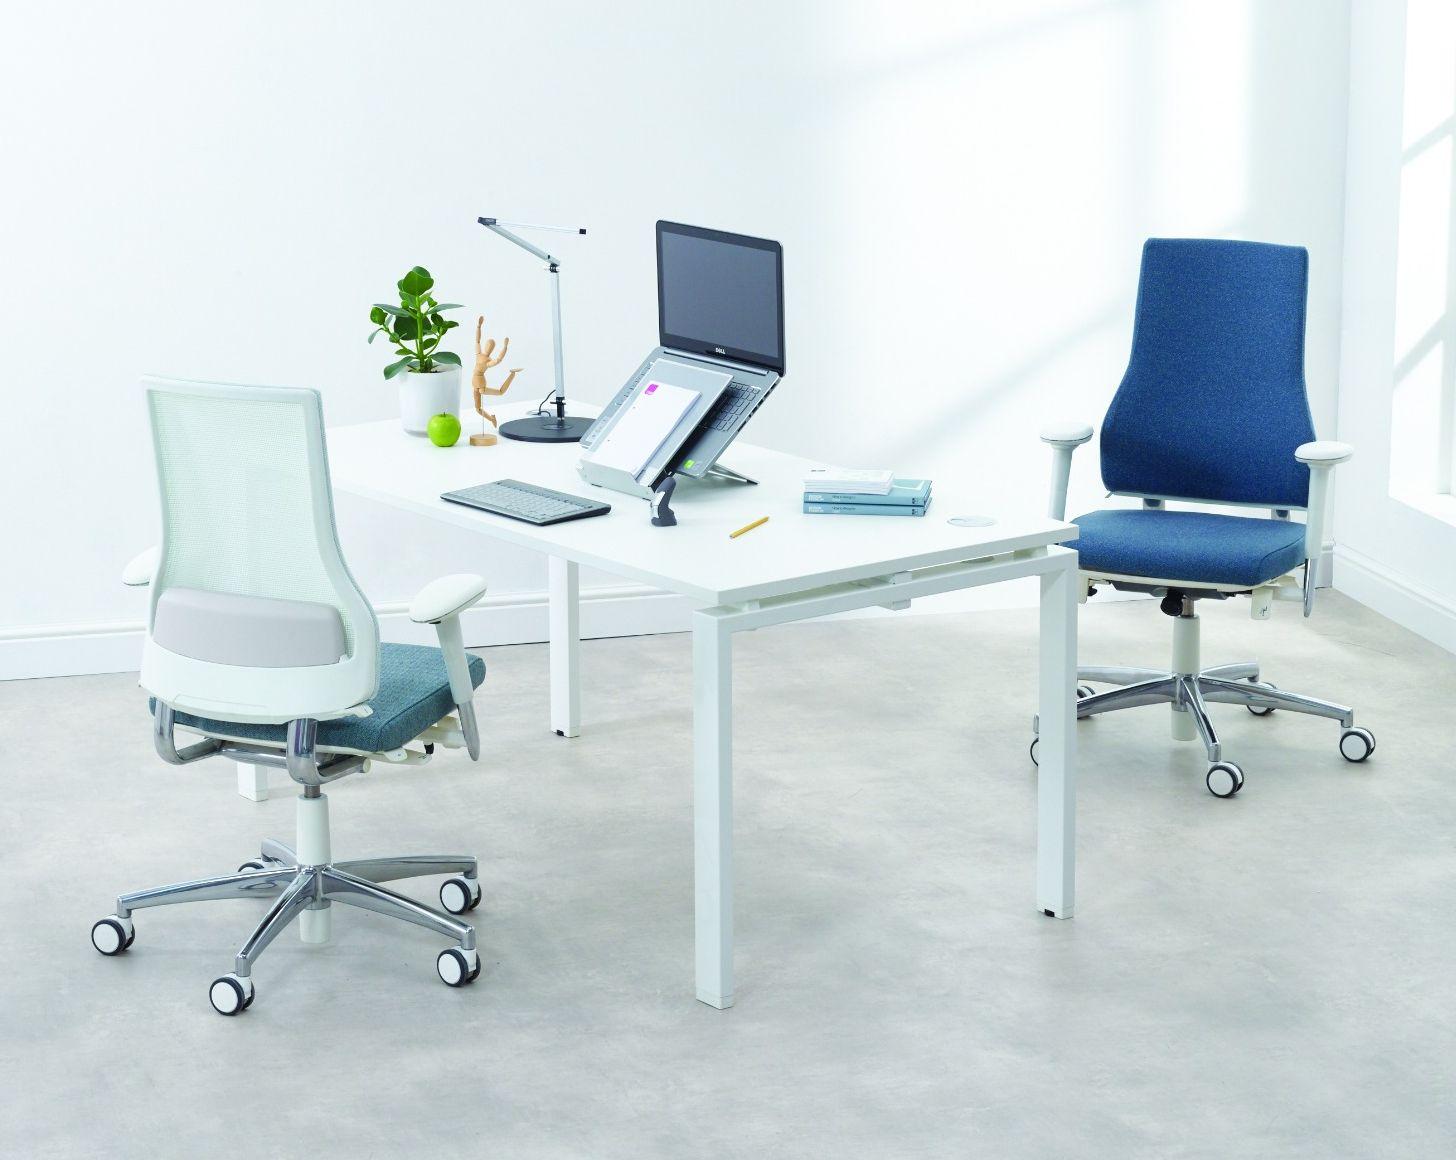 ergonomic chair principles revolving in vadodara axia 2 task